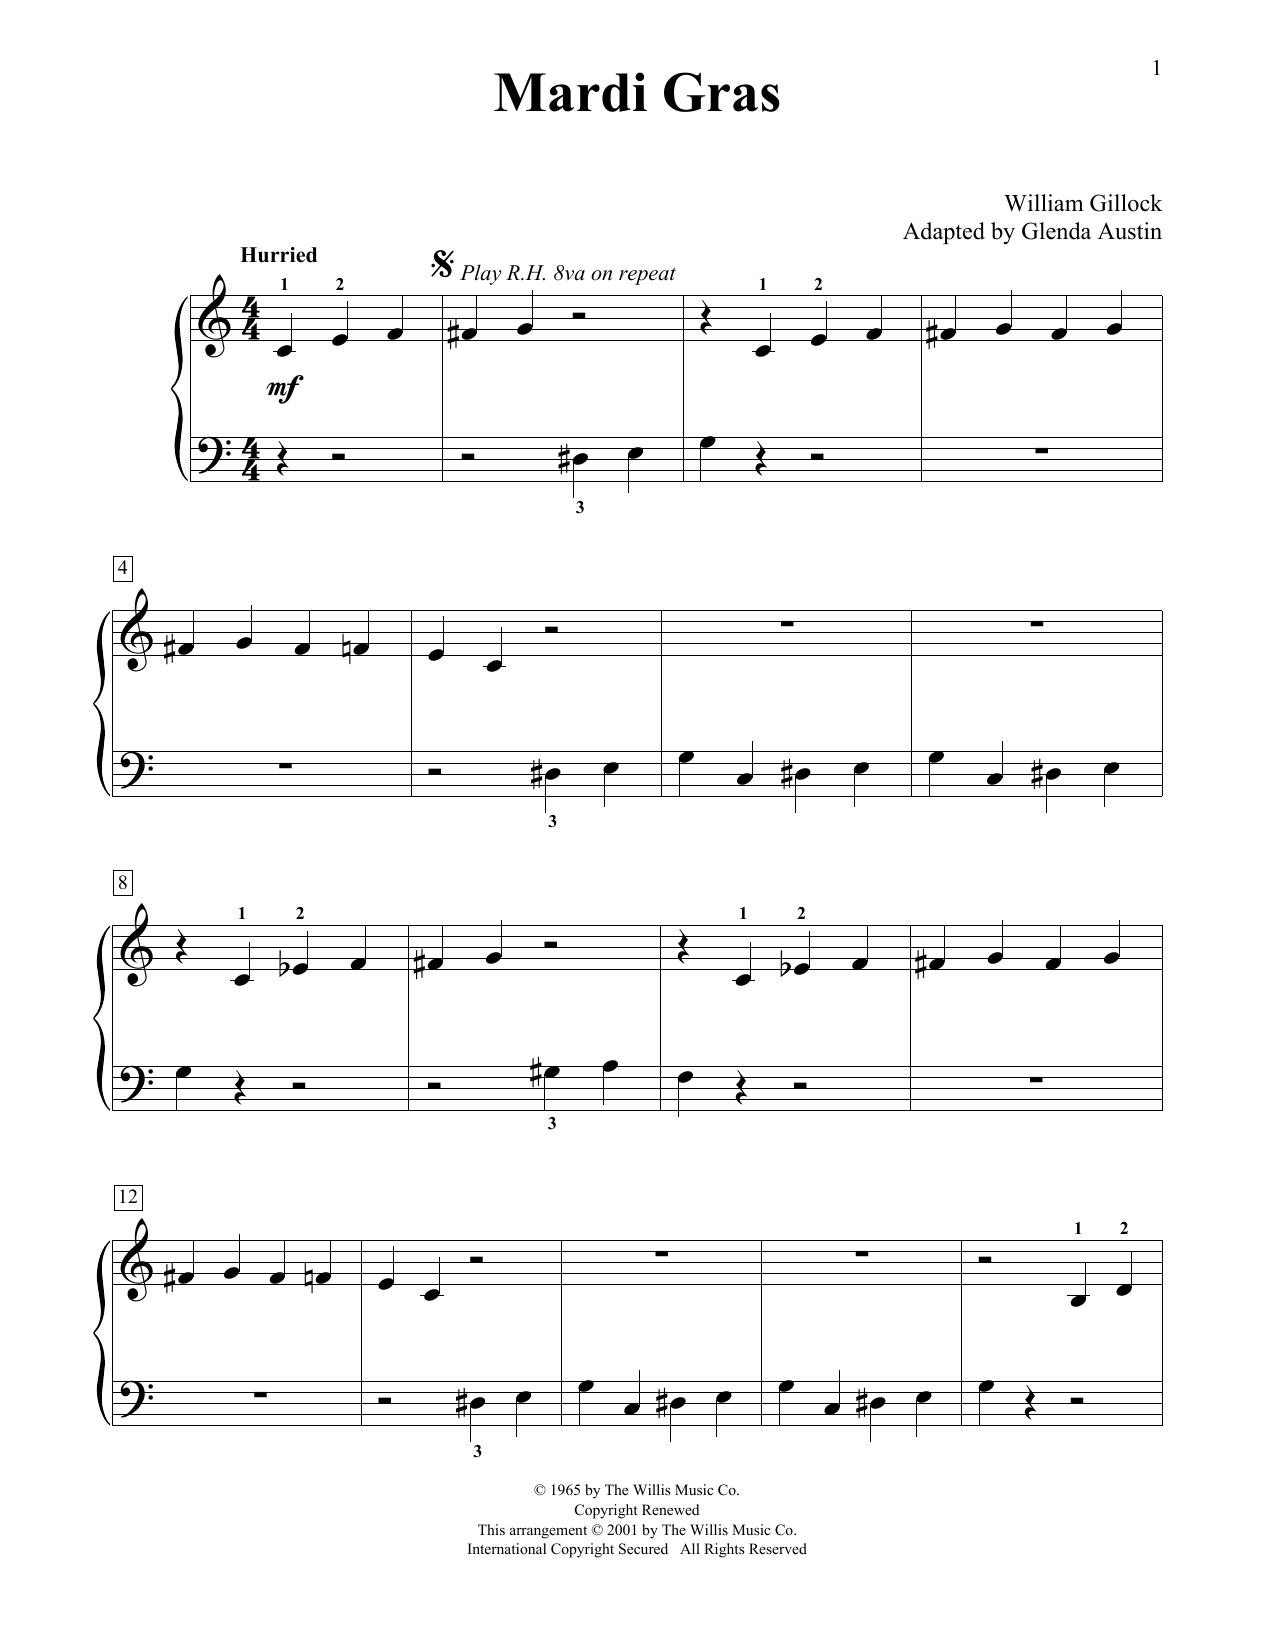 William Gillock Mardi Gras (Simplified) (adapted by Glenda Austin) sheet music notes printable PDF score